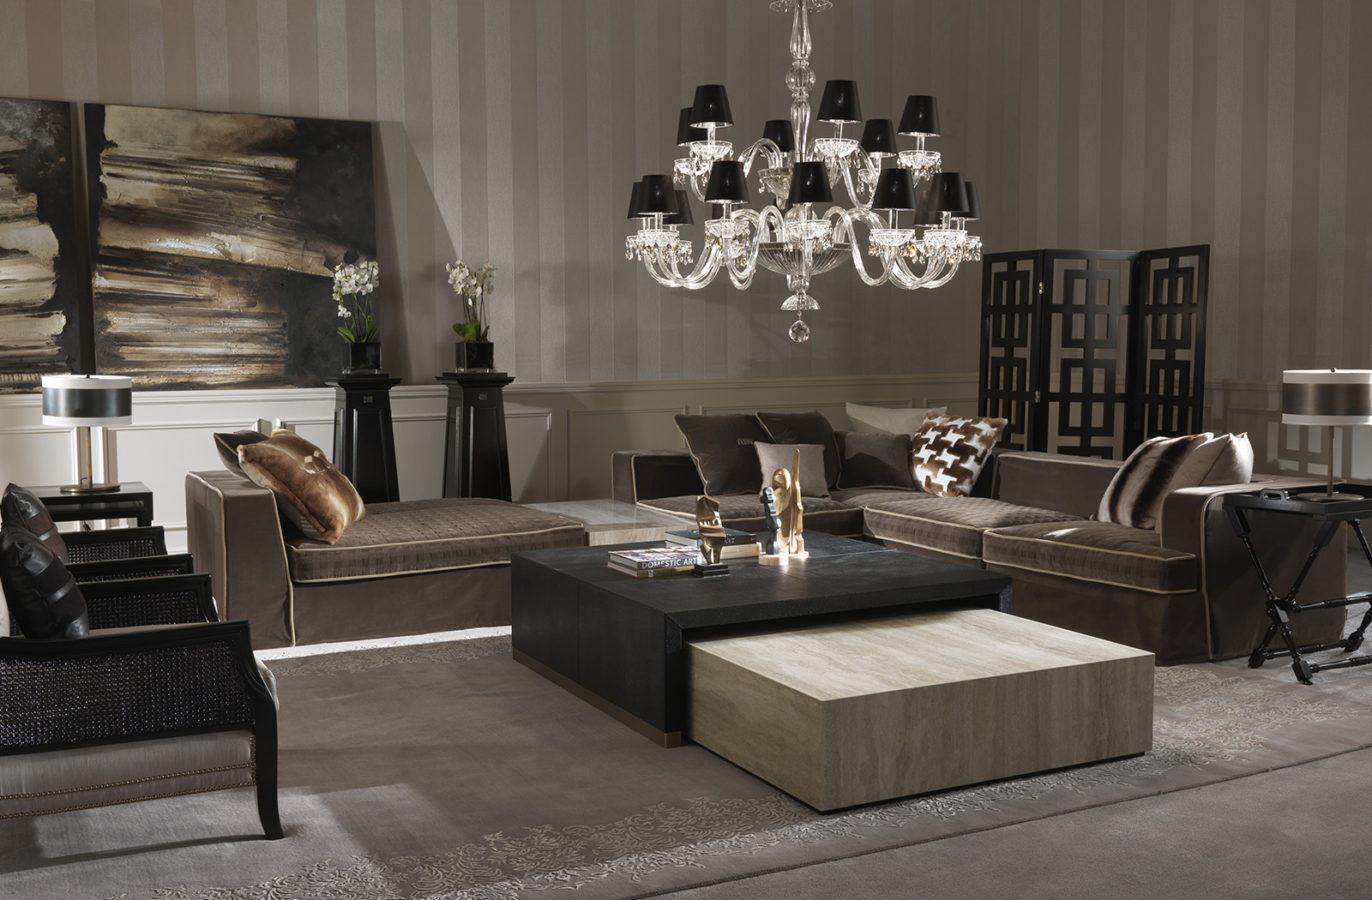 Gianfranco Ferre Home Flair Modular Sofa 02